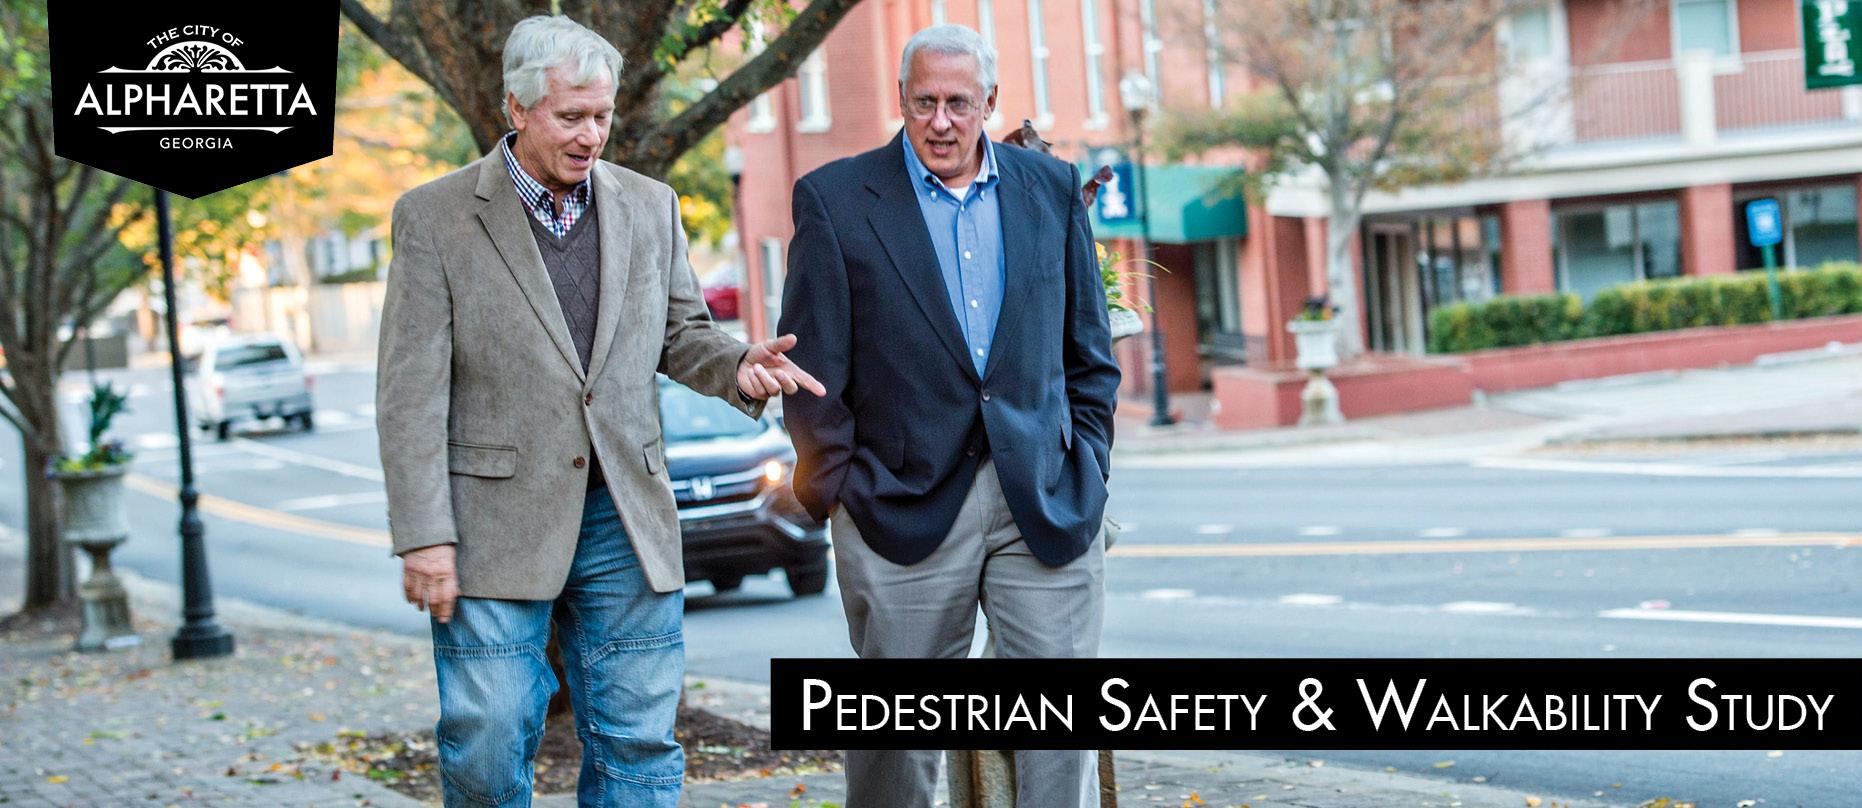 Pedestrian Study News Item Image